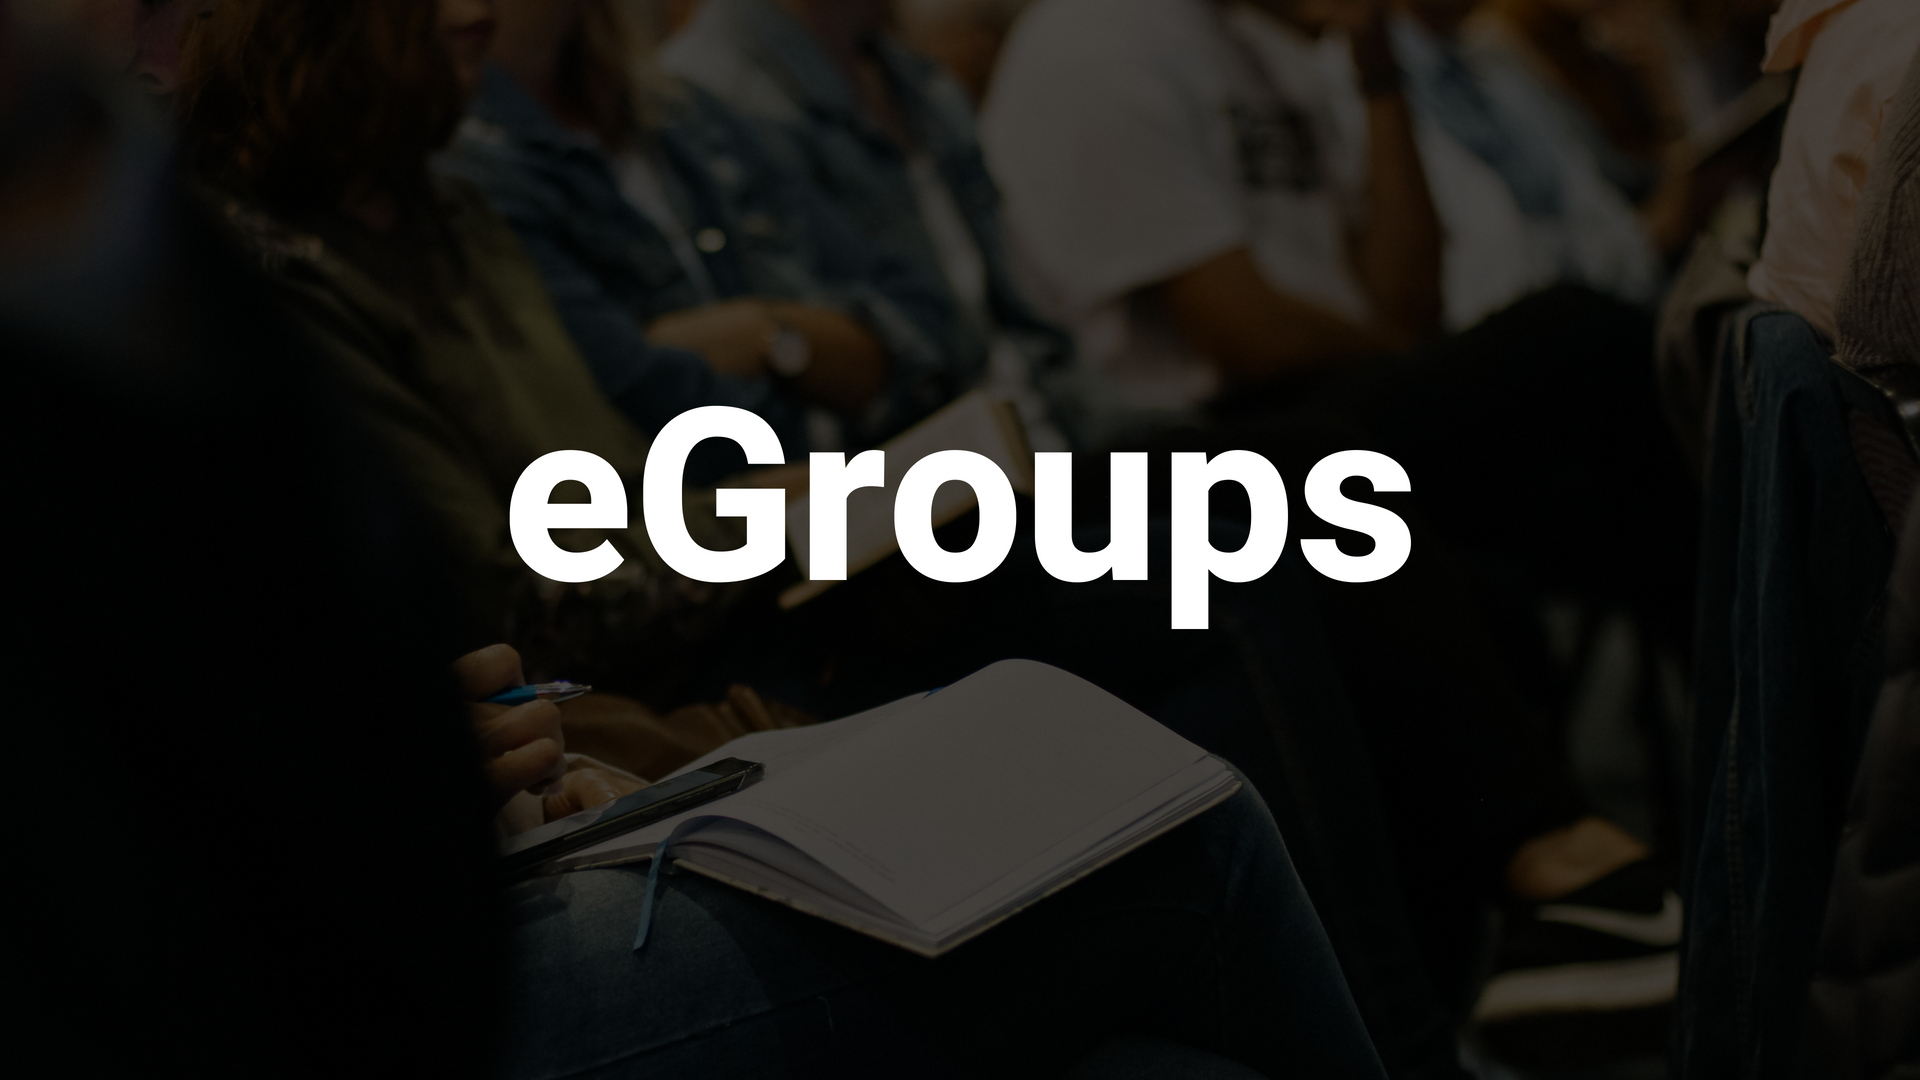 eGroups.jpg